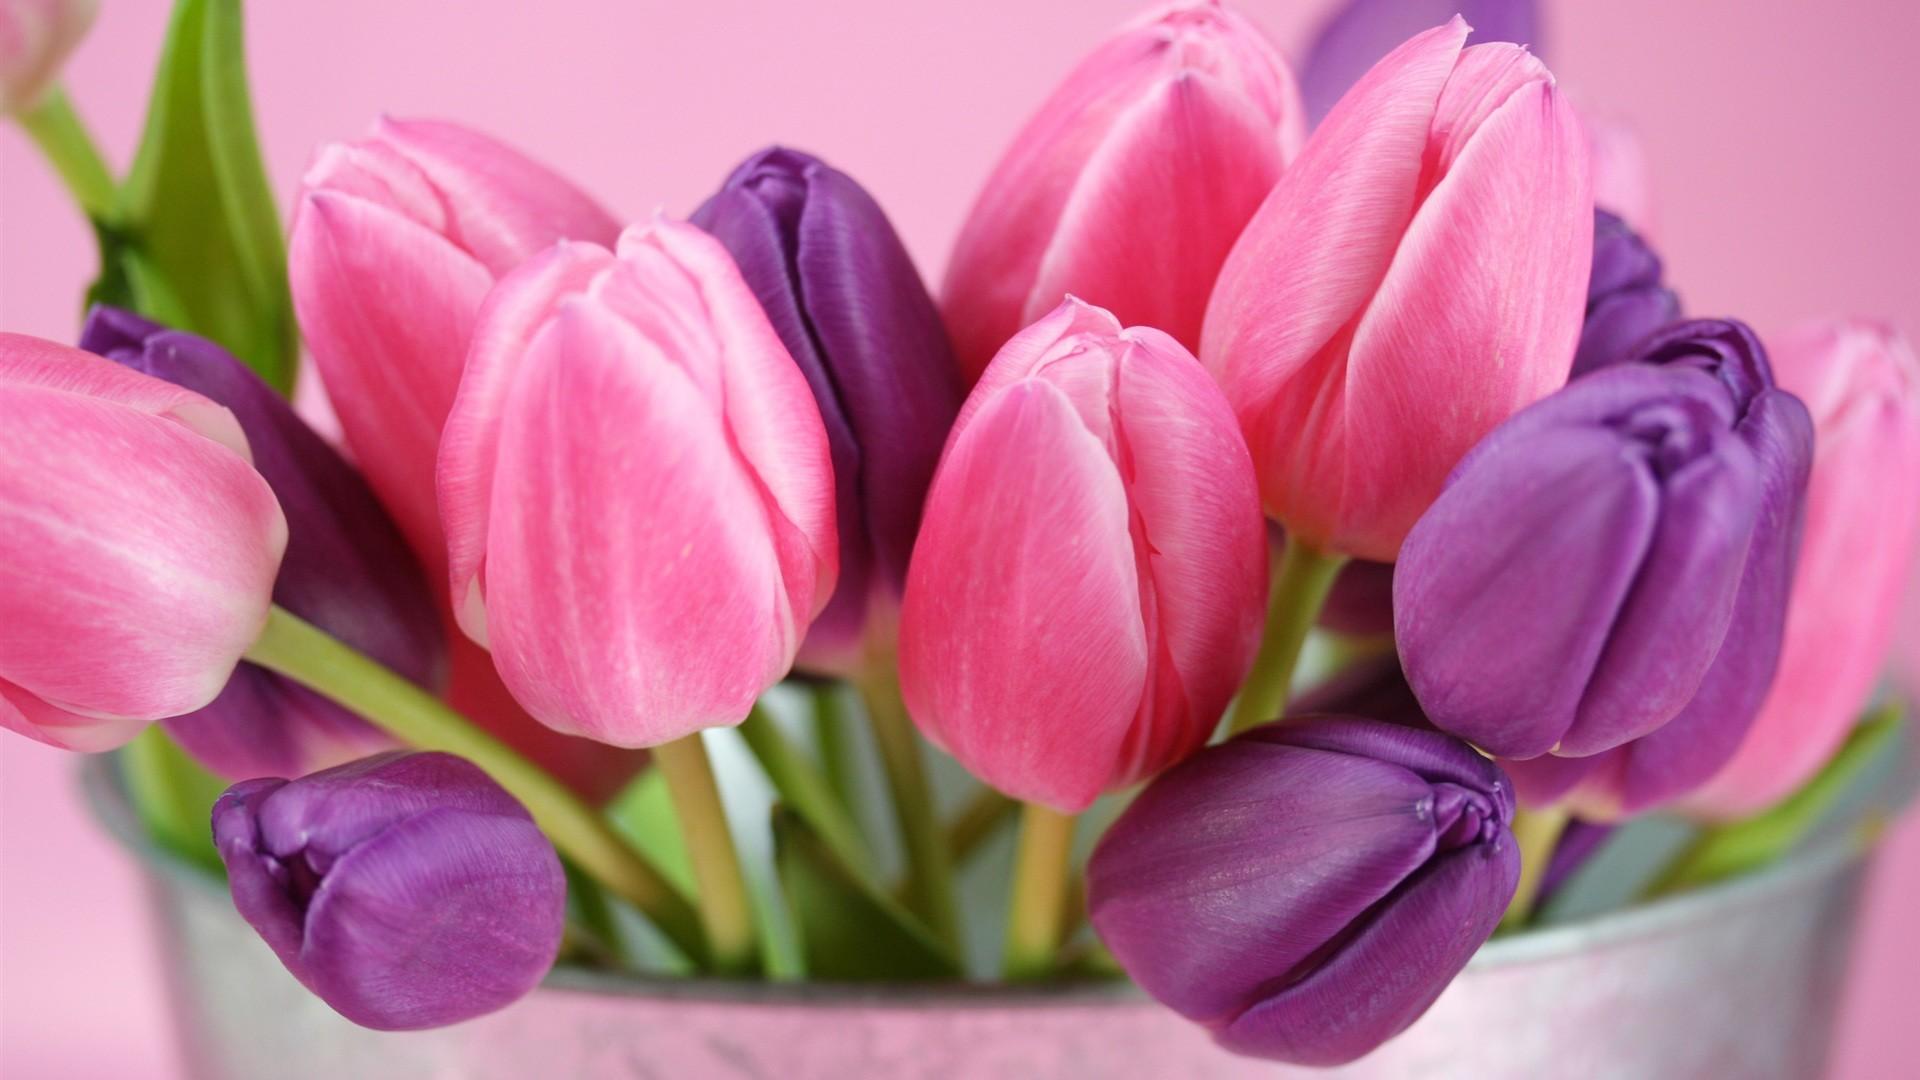 flowers-tulips-purple-wallpaper-pink-flower-wallwuzz-hd-wallpaper-18947 –  Magic4Walls.com